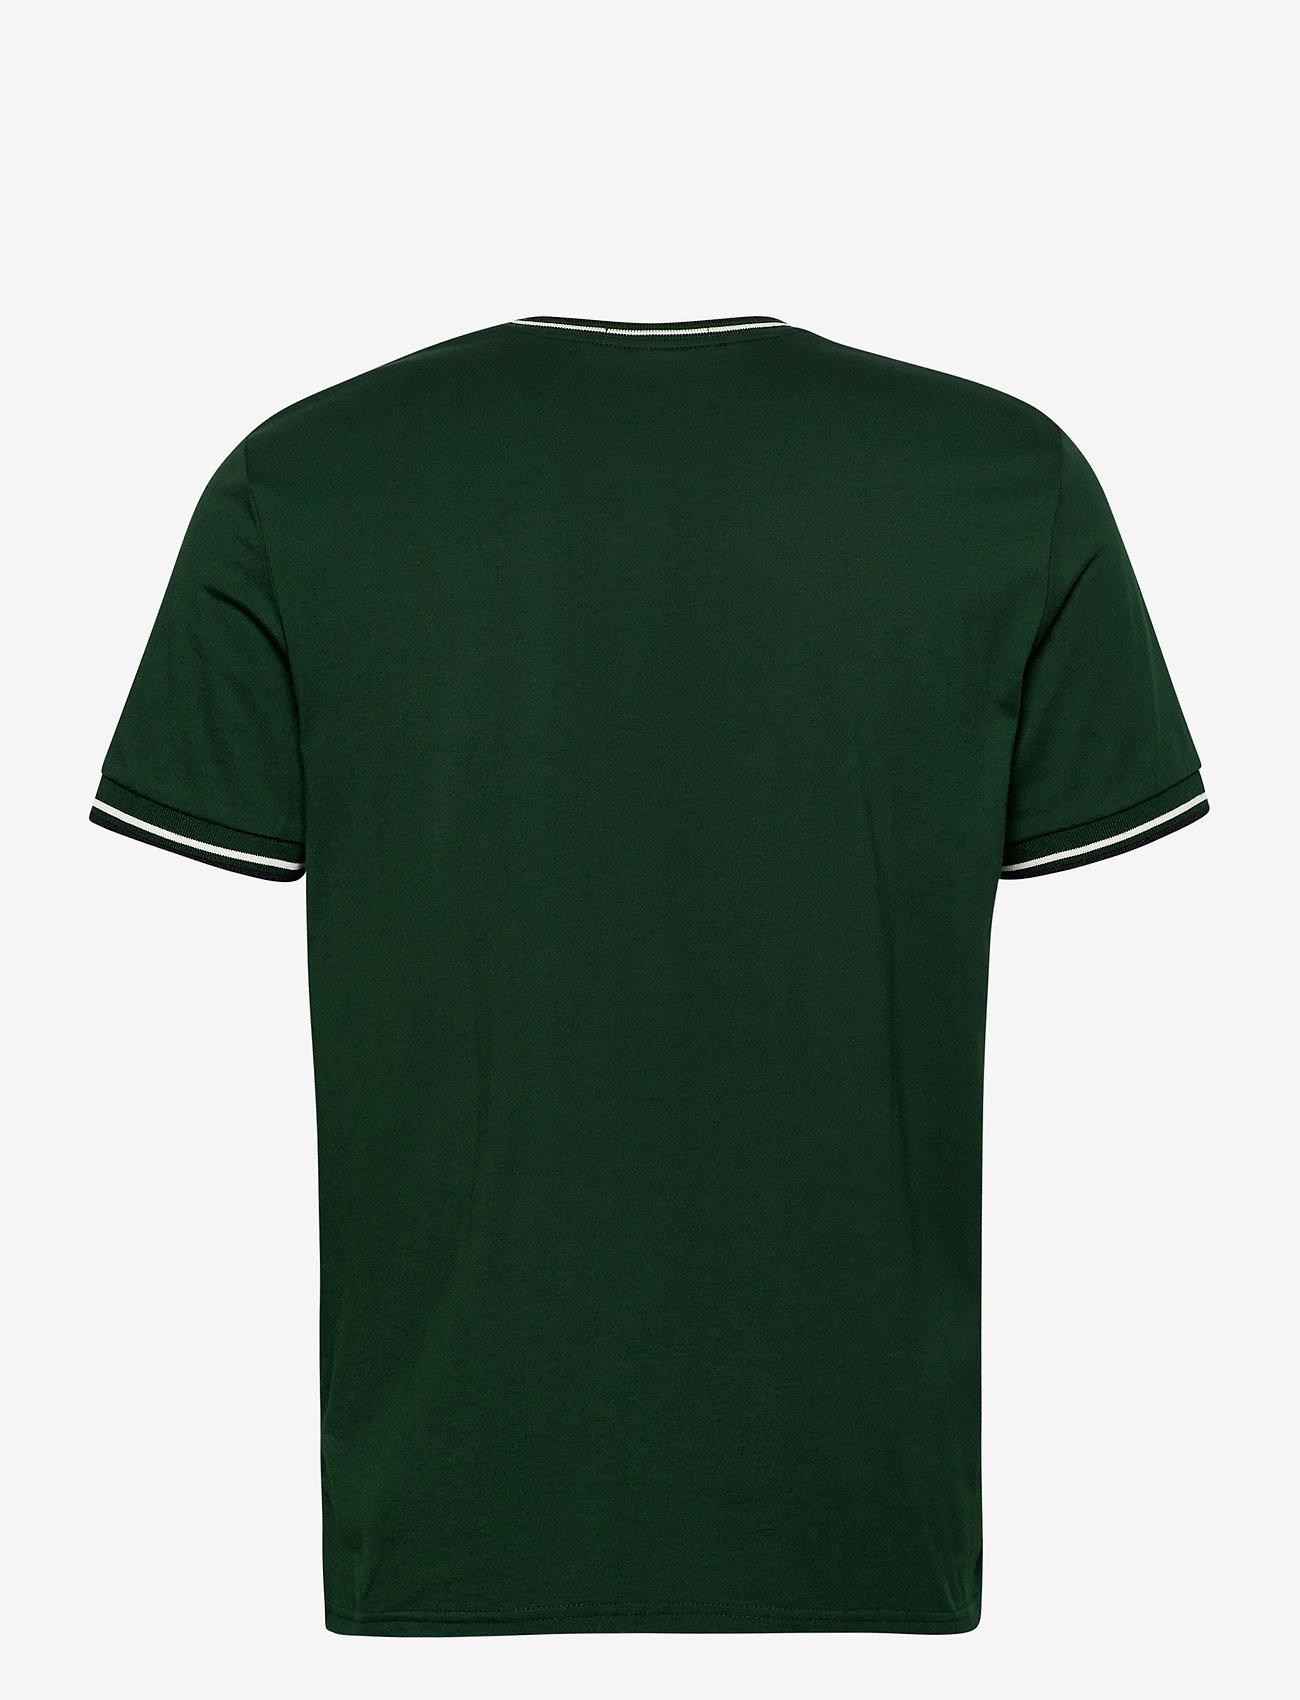 Fred Perry TWIN TIPPED T-SHIRT - T-skjorter IVY - Menn Klær